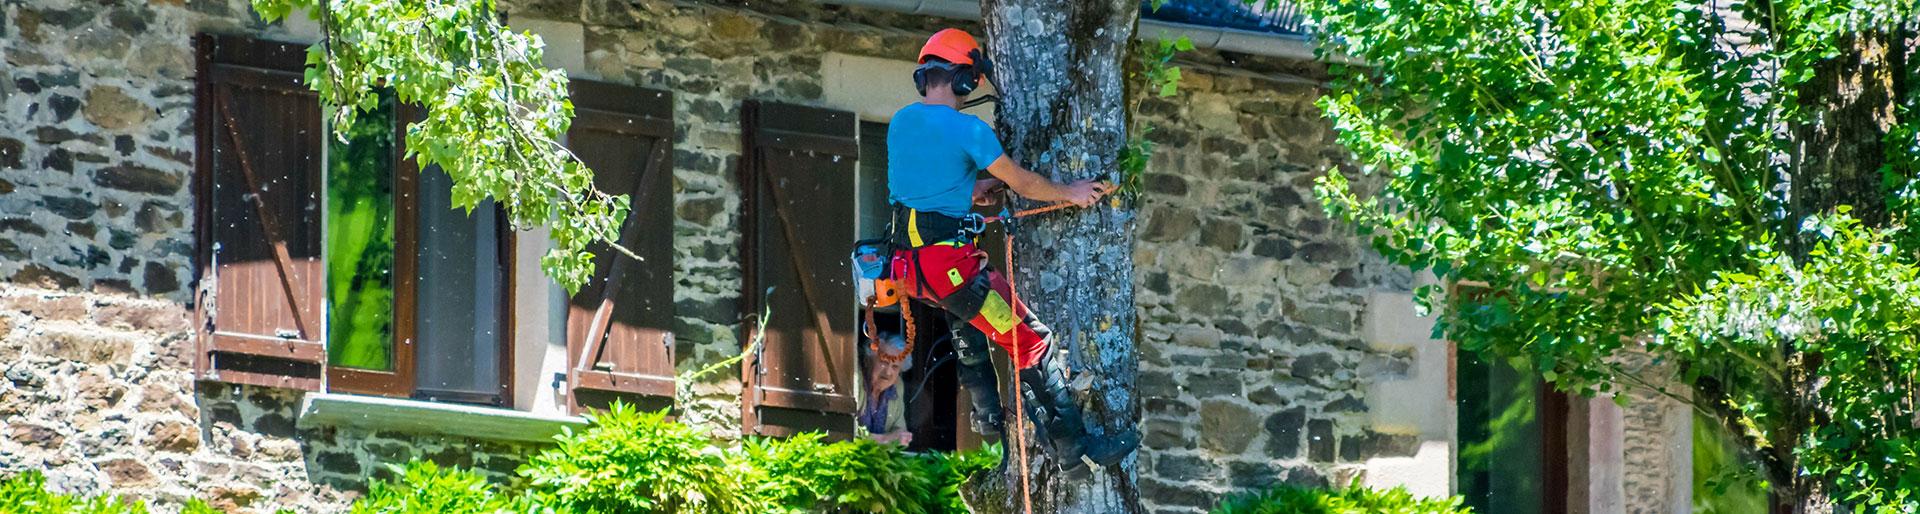 CS AE - Elagueur dans un arbre